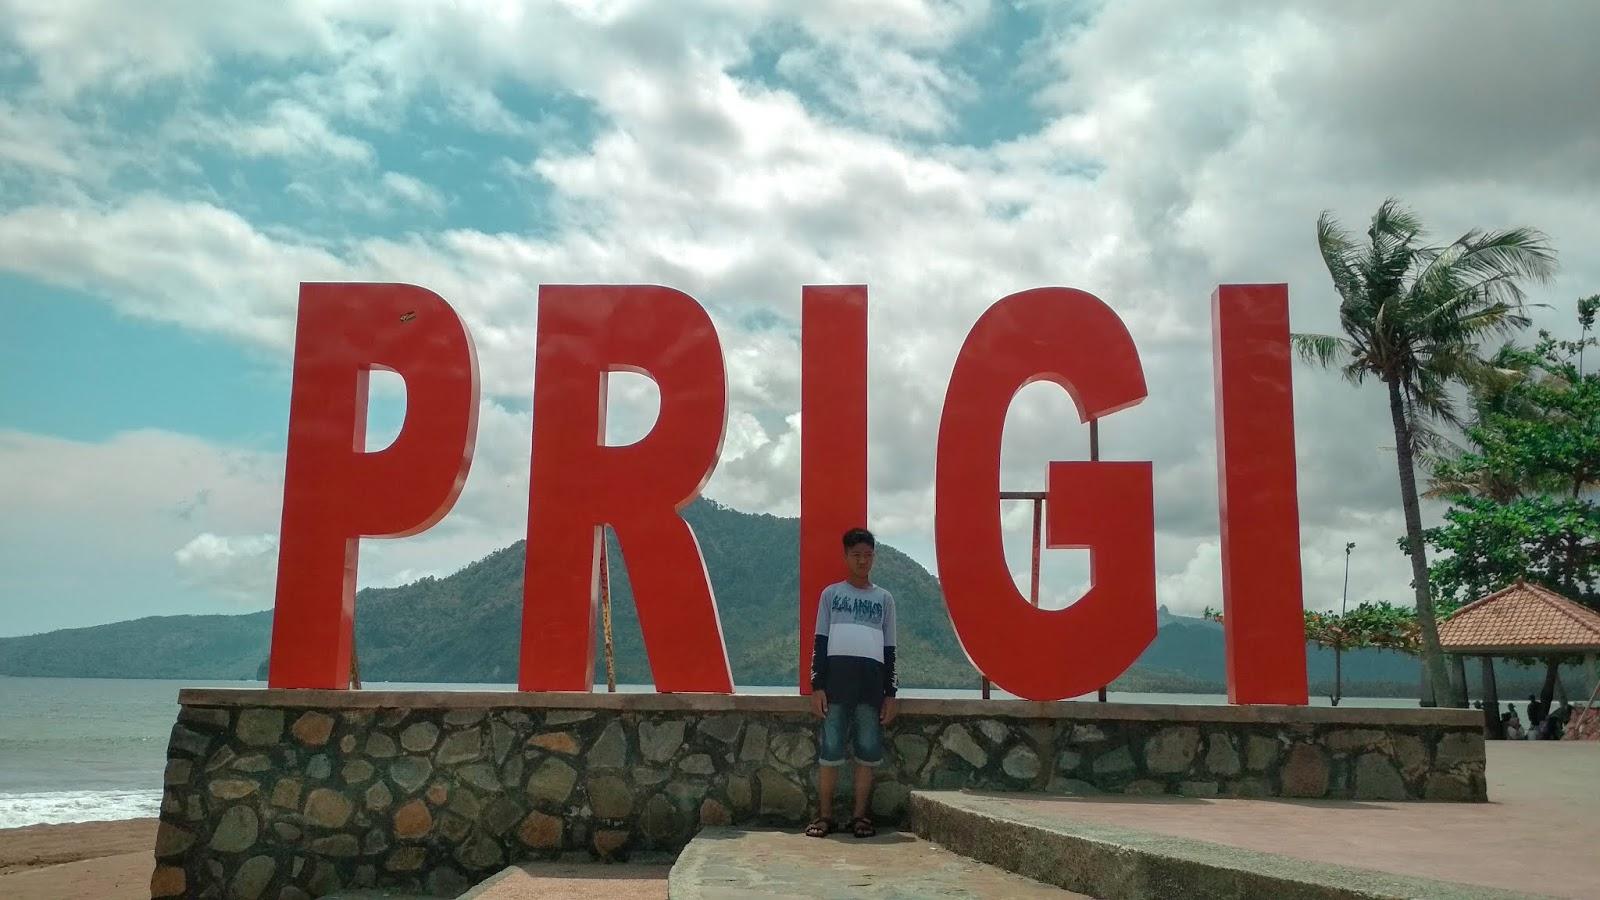 Pantai Prigi Trenggalek Jawa Timur